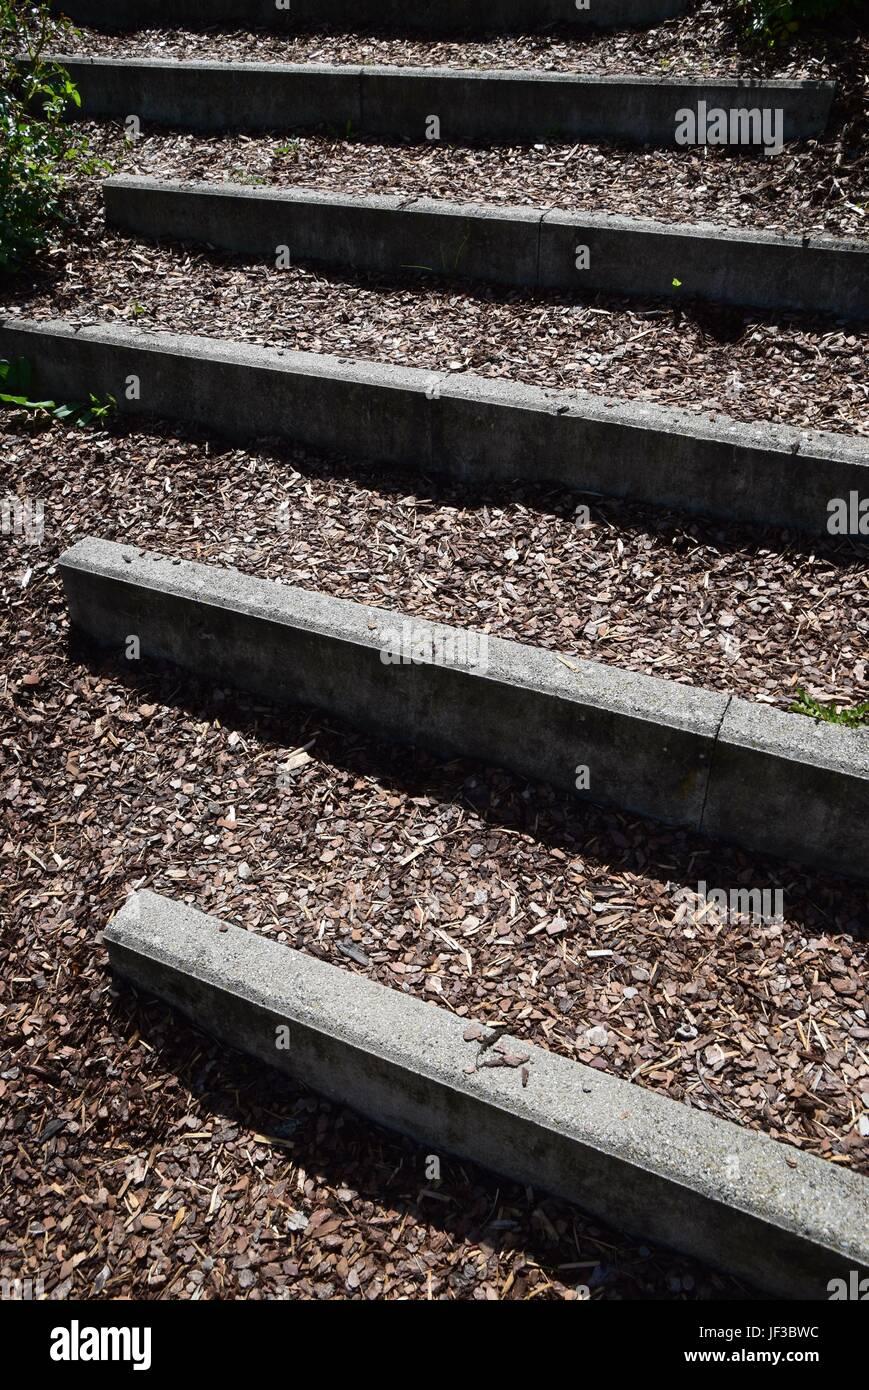 Treppenaufgang - Stock Image